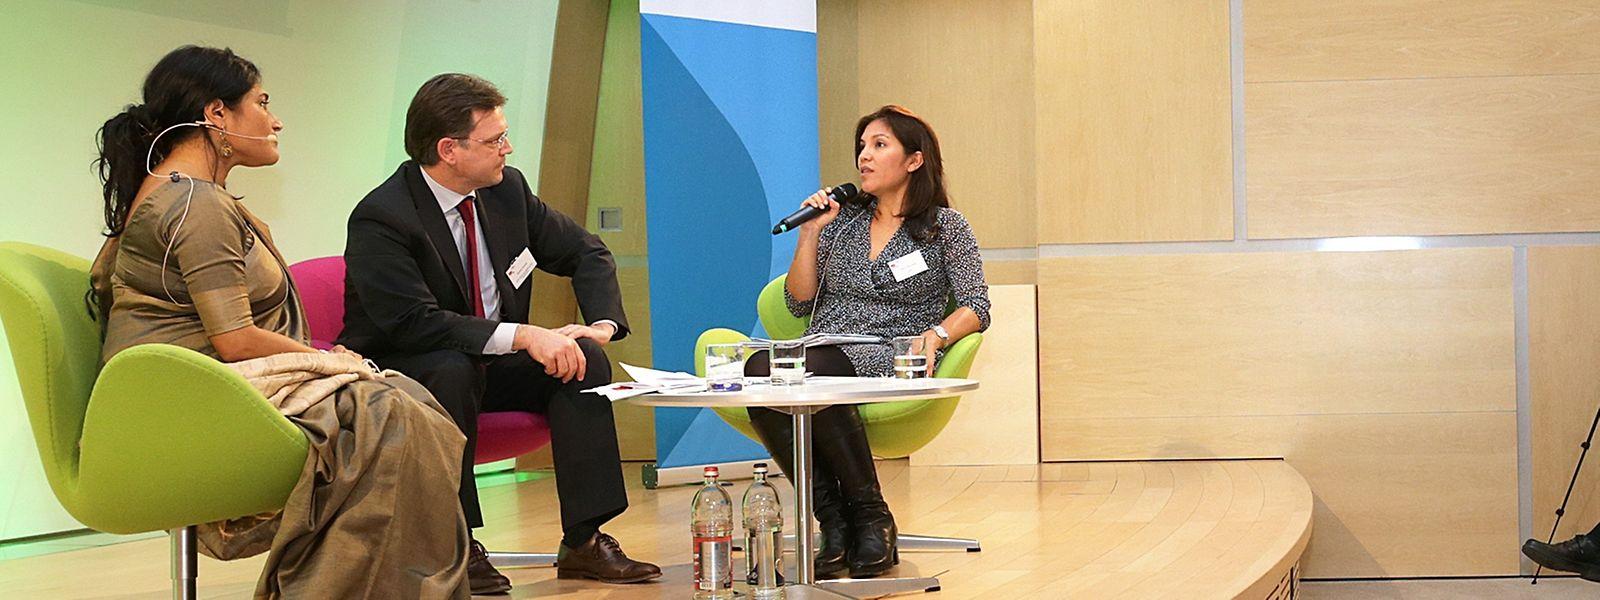 Runa Khan, Jérôme Broutin und Carla Palomares.